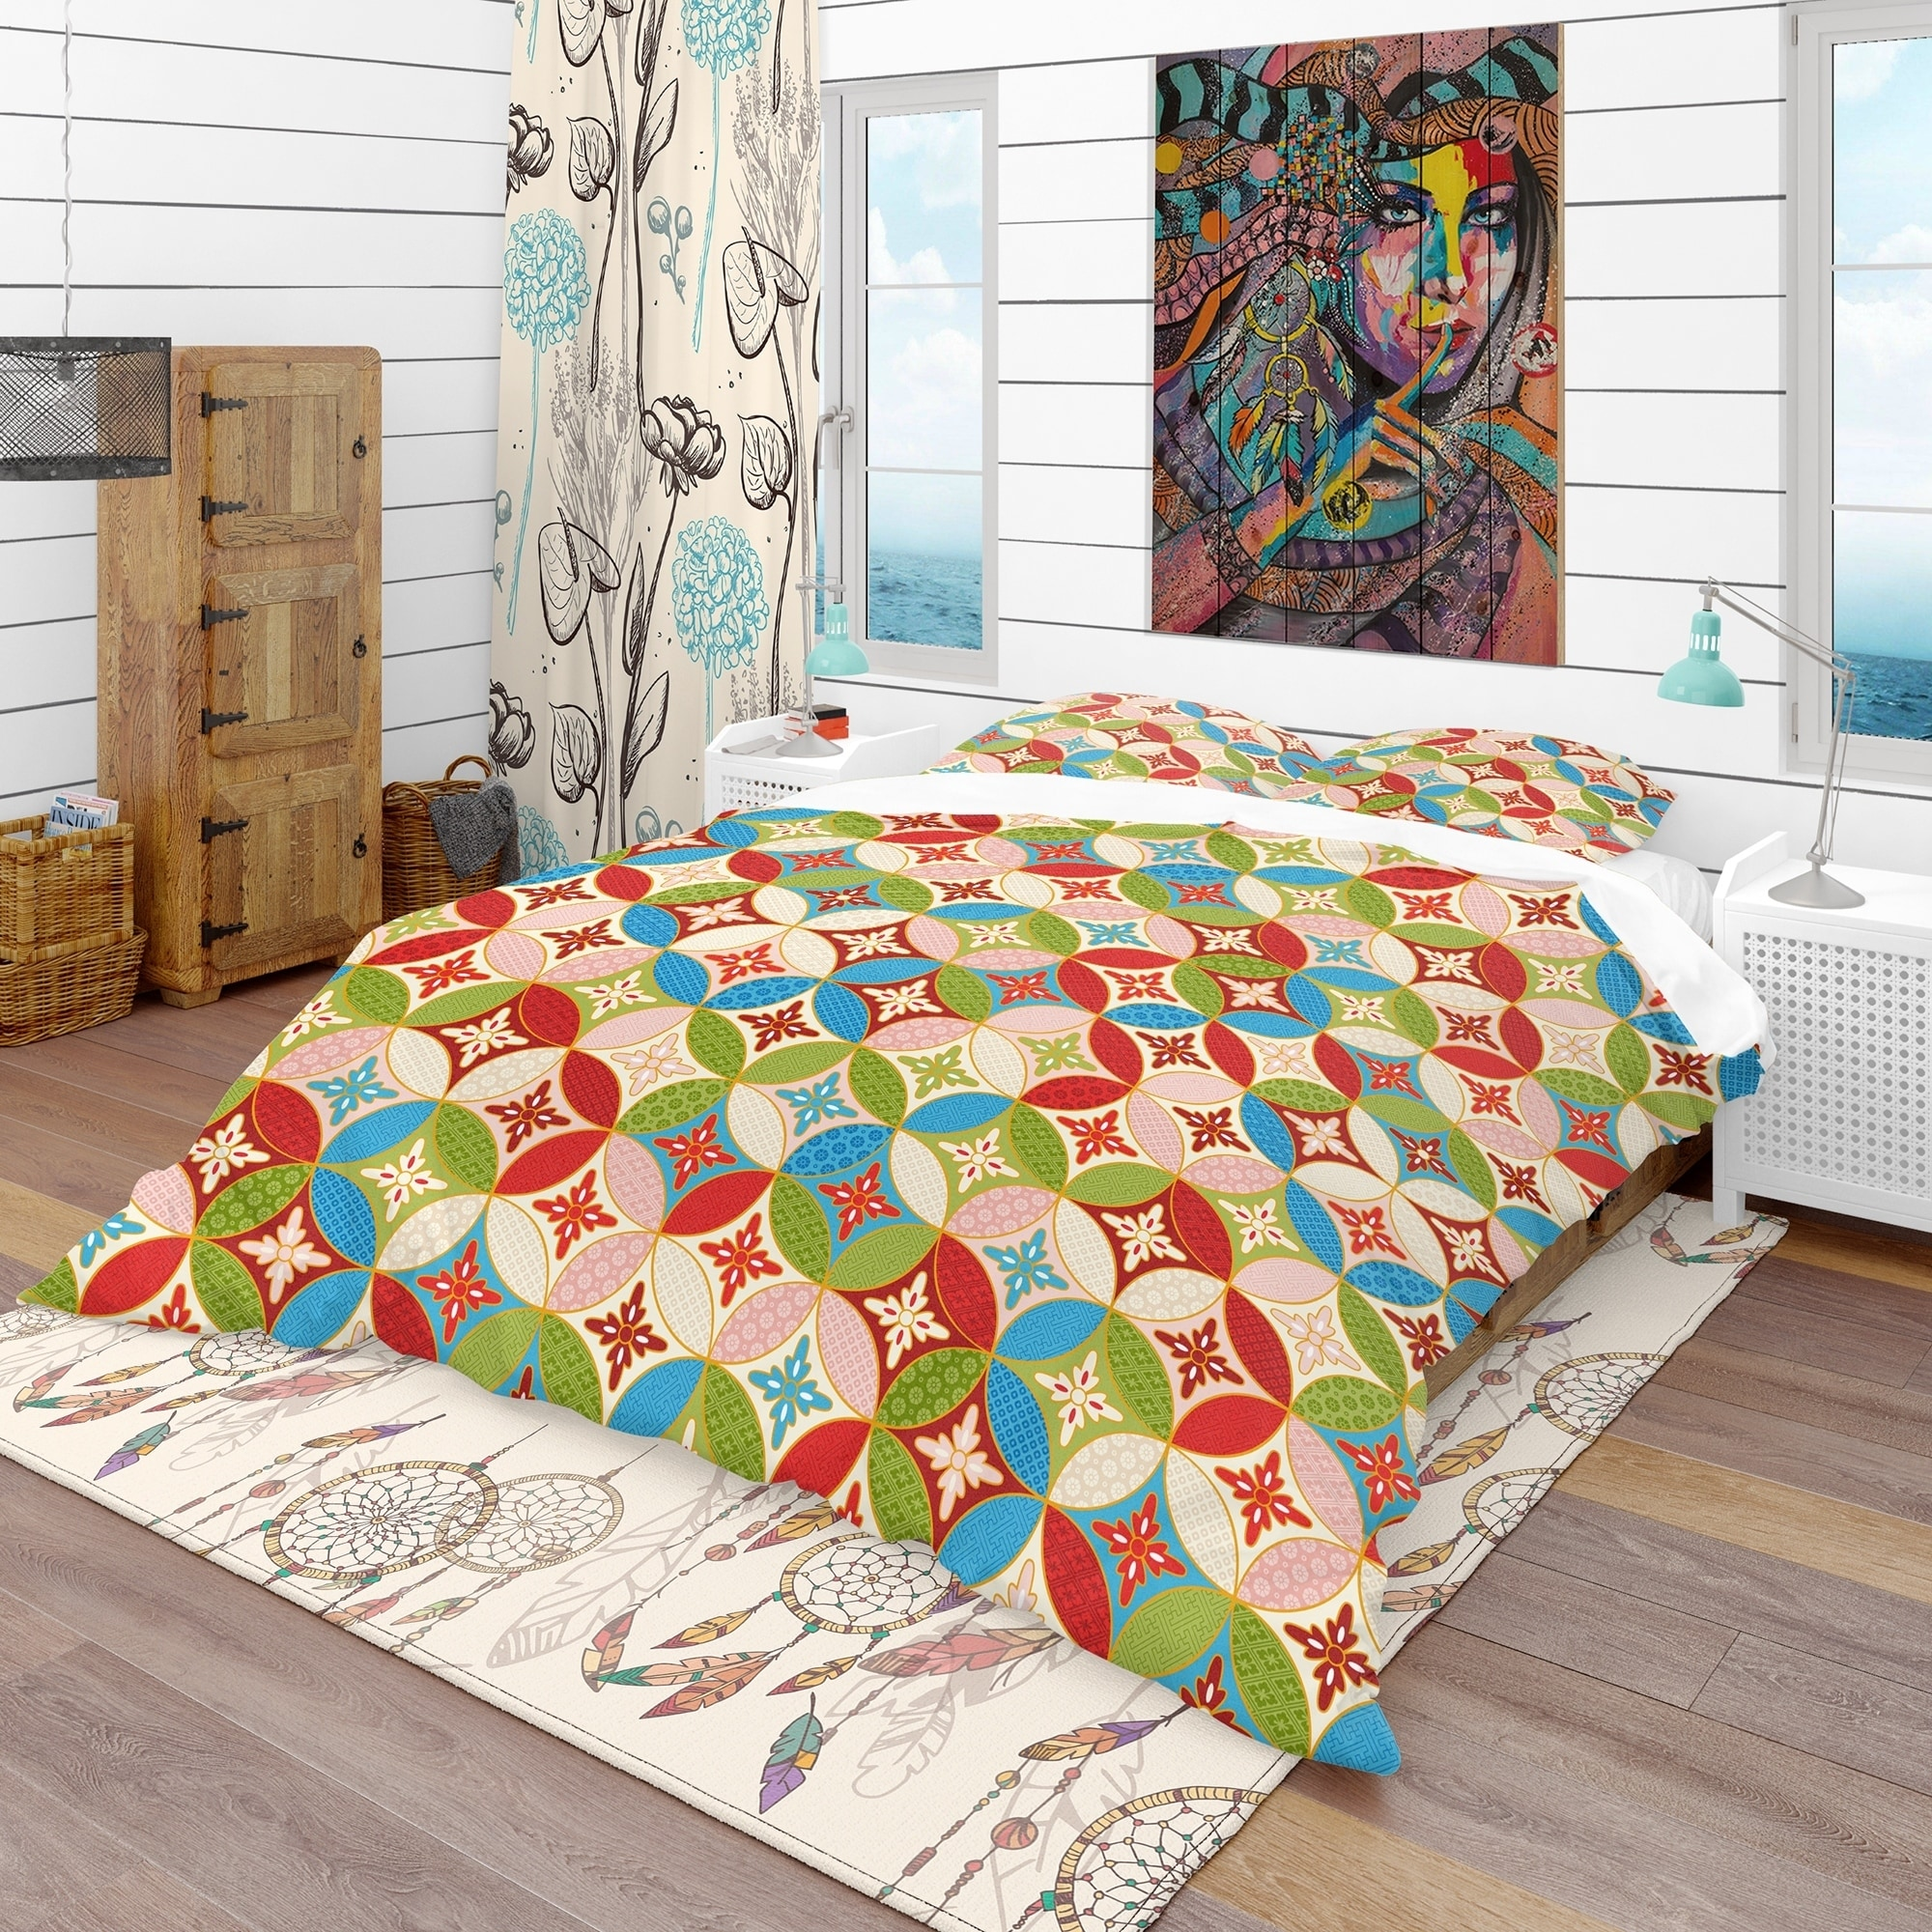 Designart Circles Japanese Texture Bohemian Eclectic Duvet Cover Twin Bedding Set 1 Sham Green Walmart Com Walmart Com